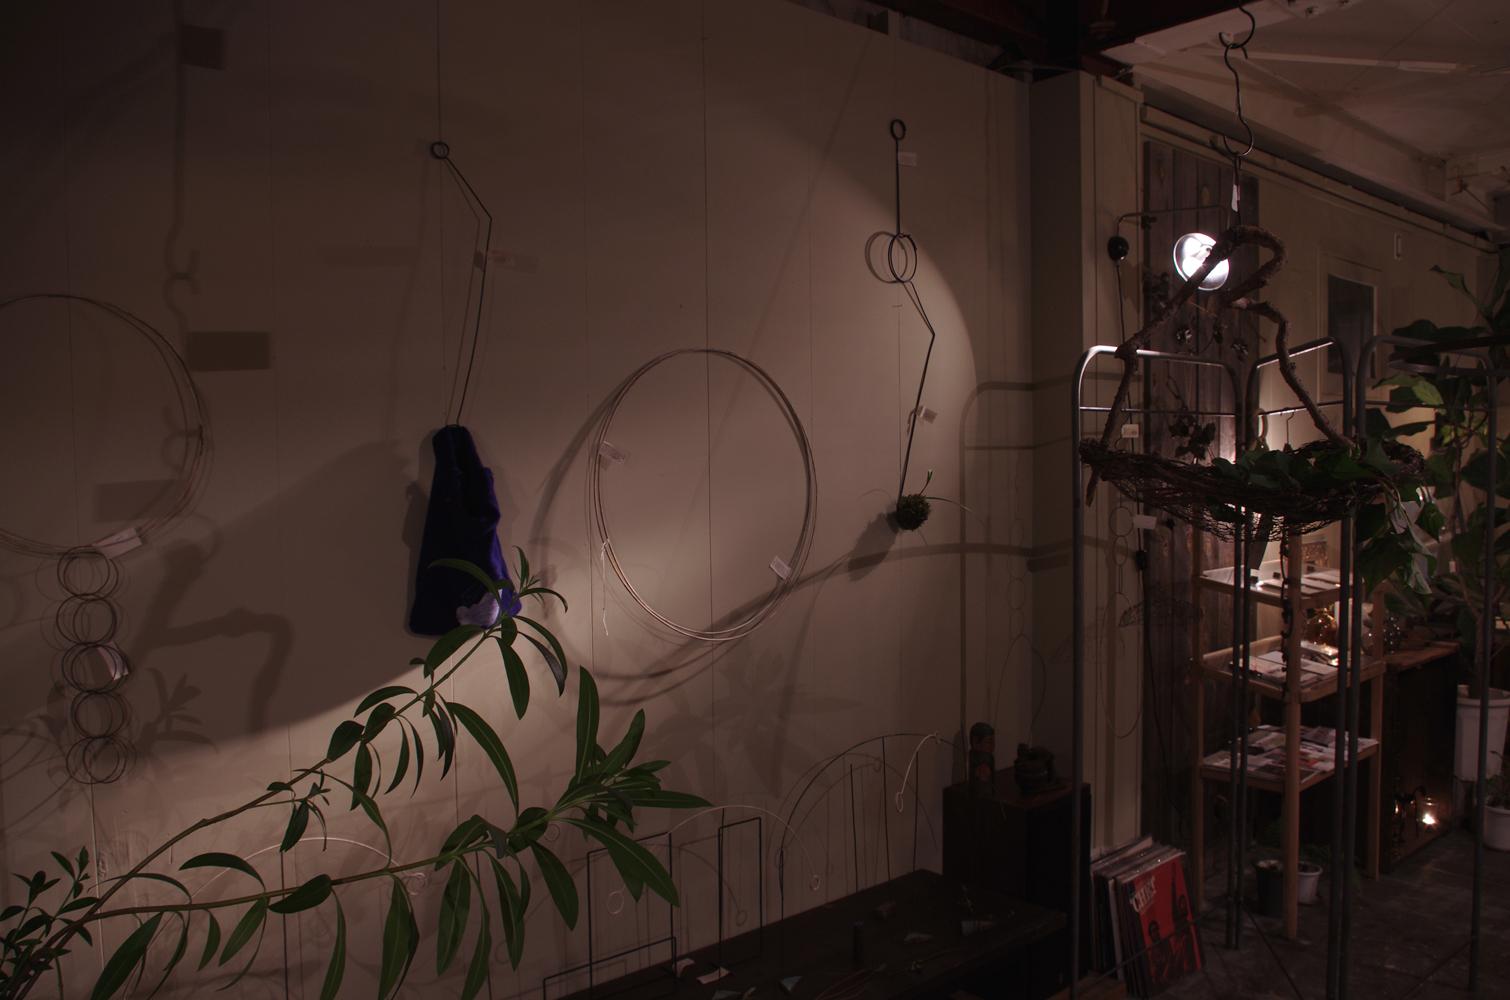 tipura-studio-ironworks-exhibition-23